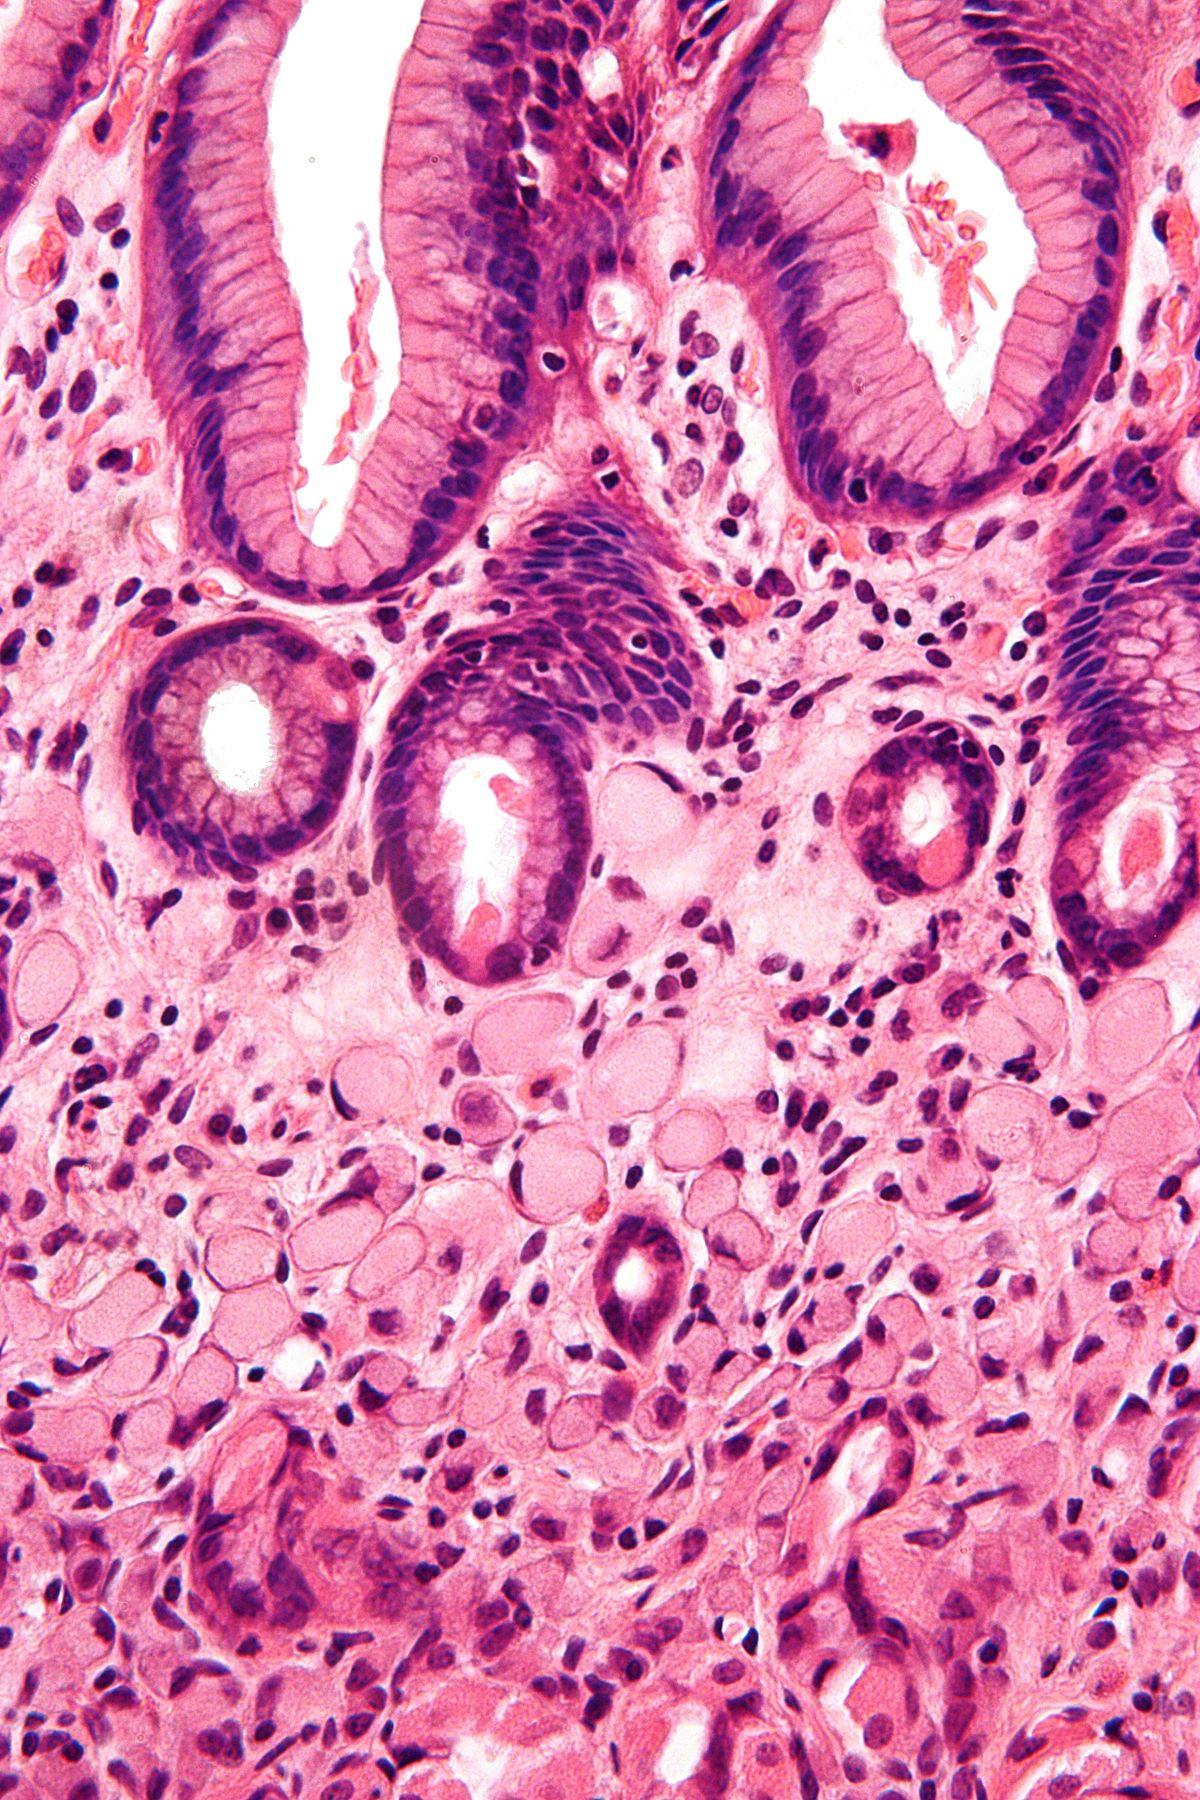 abdominal cancer cells)